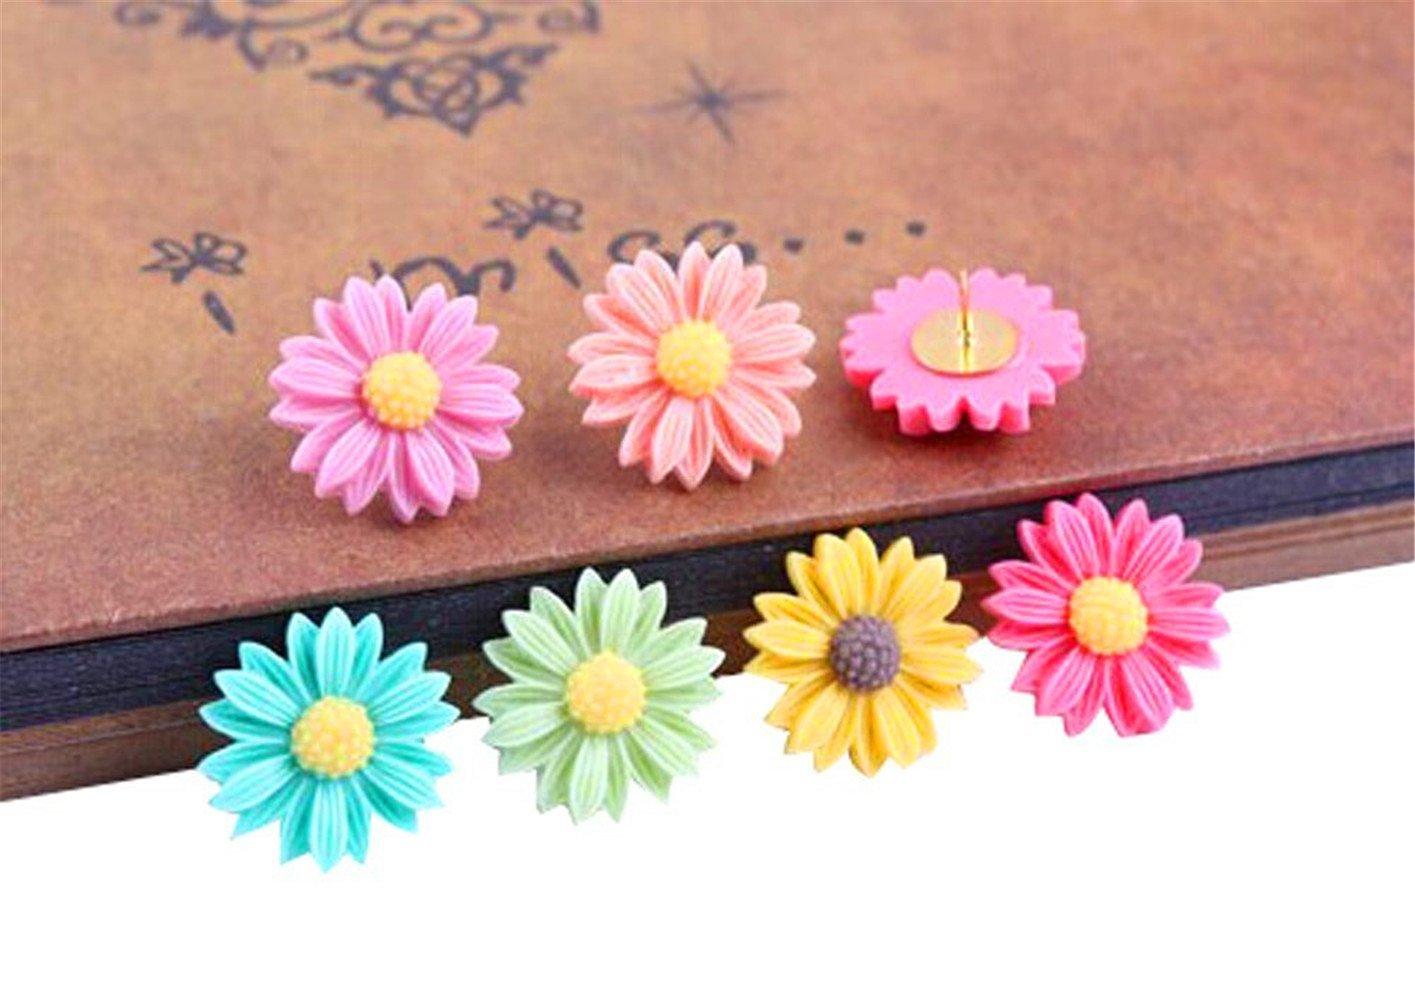 Kangkang@ Creative Office Item/colorful Floret Series Pushpins/10 Piece/random Color Creative Office Item/colorful Floret Series Pushpins/10 Piece/random Color